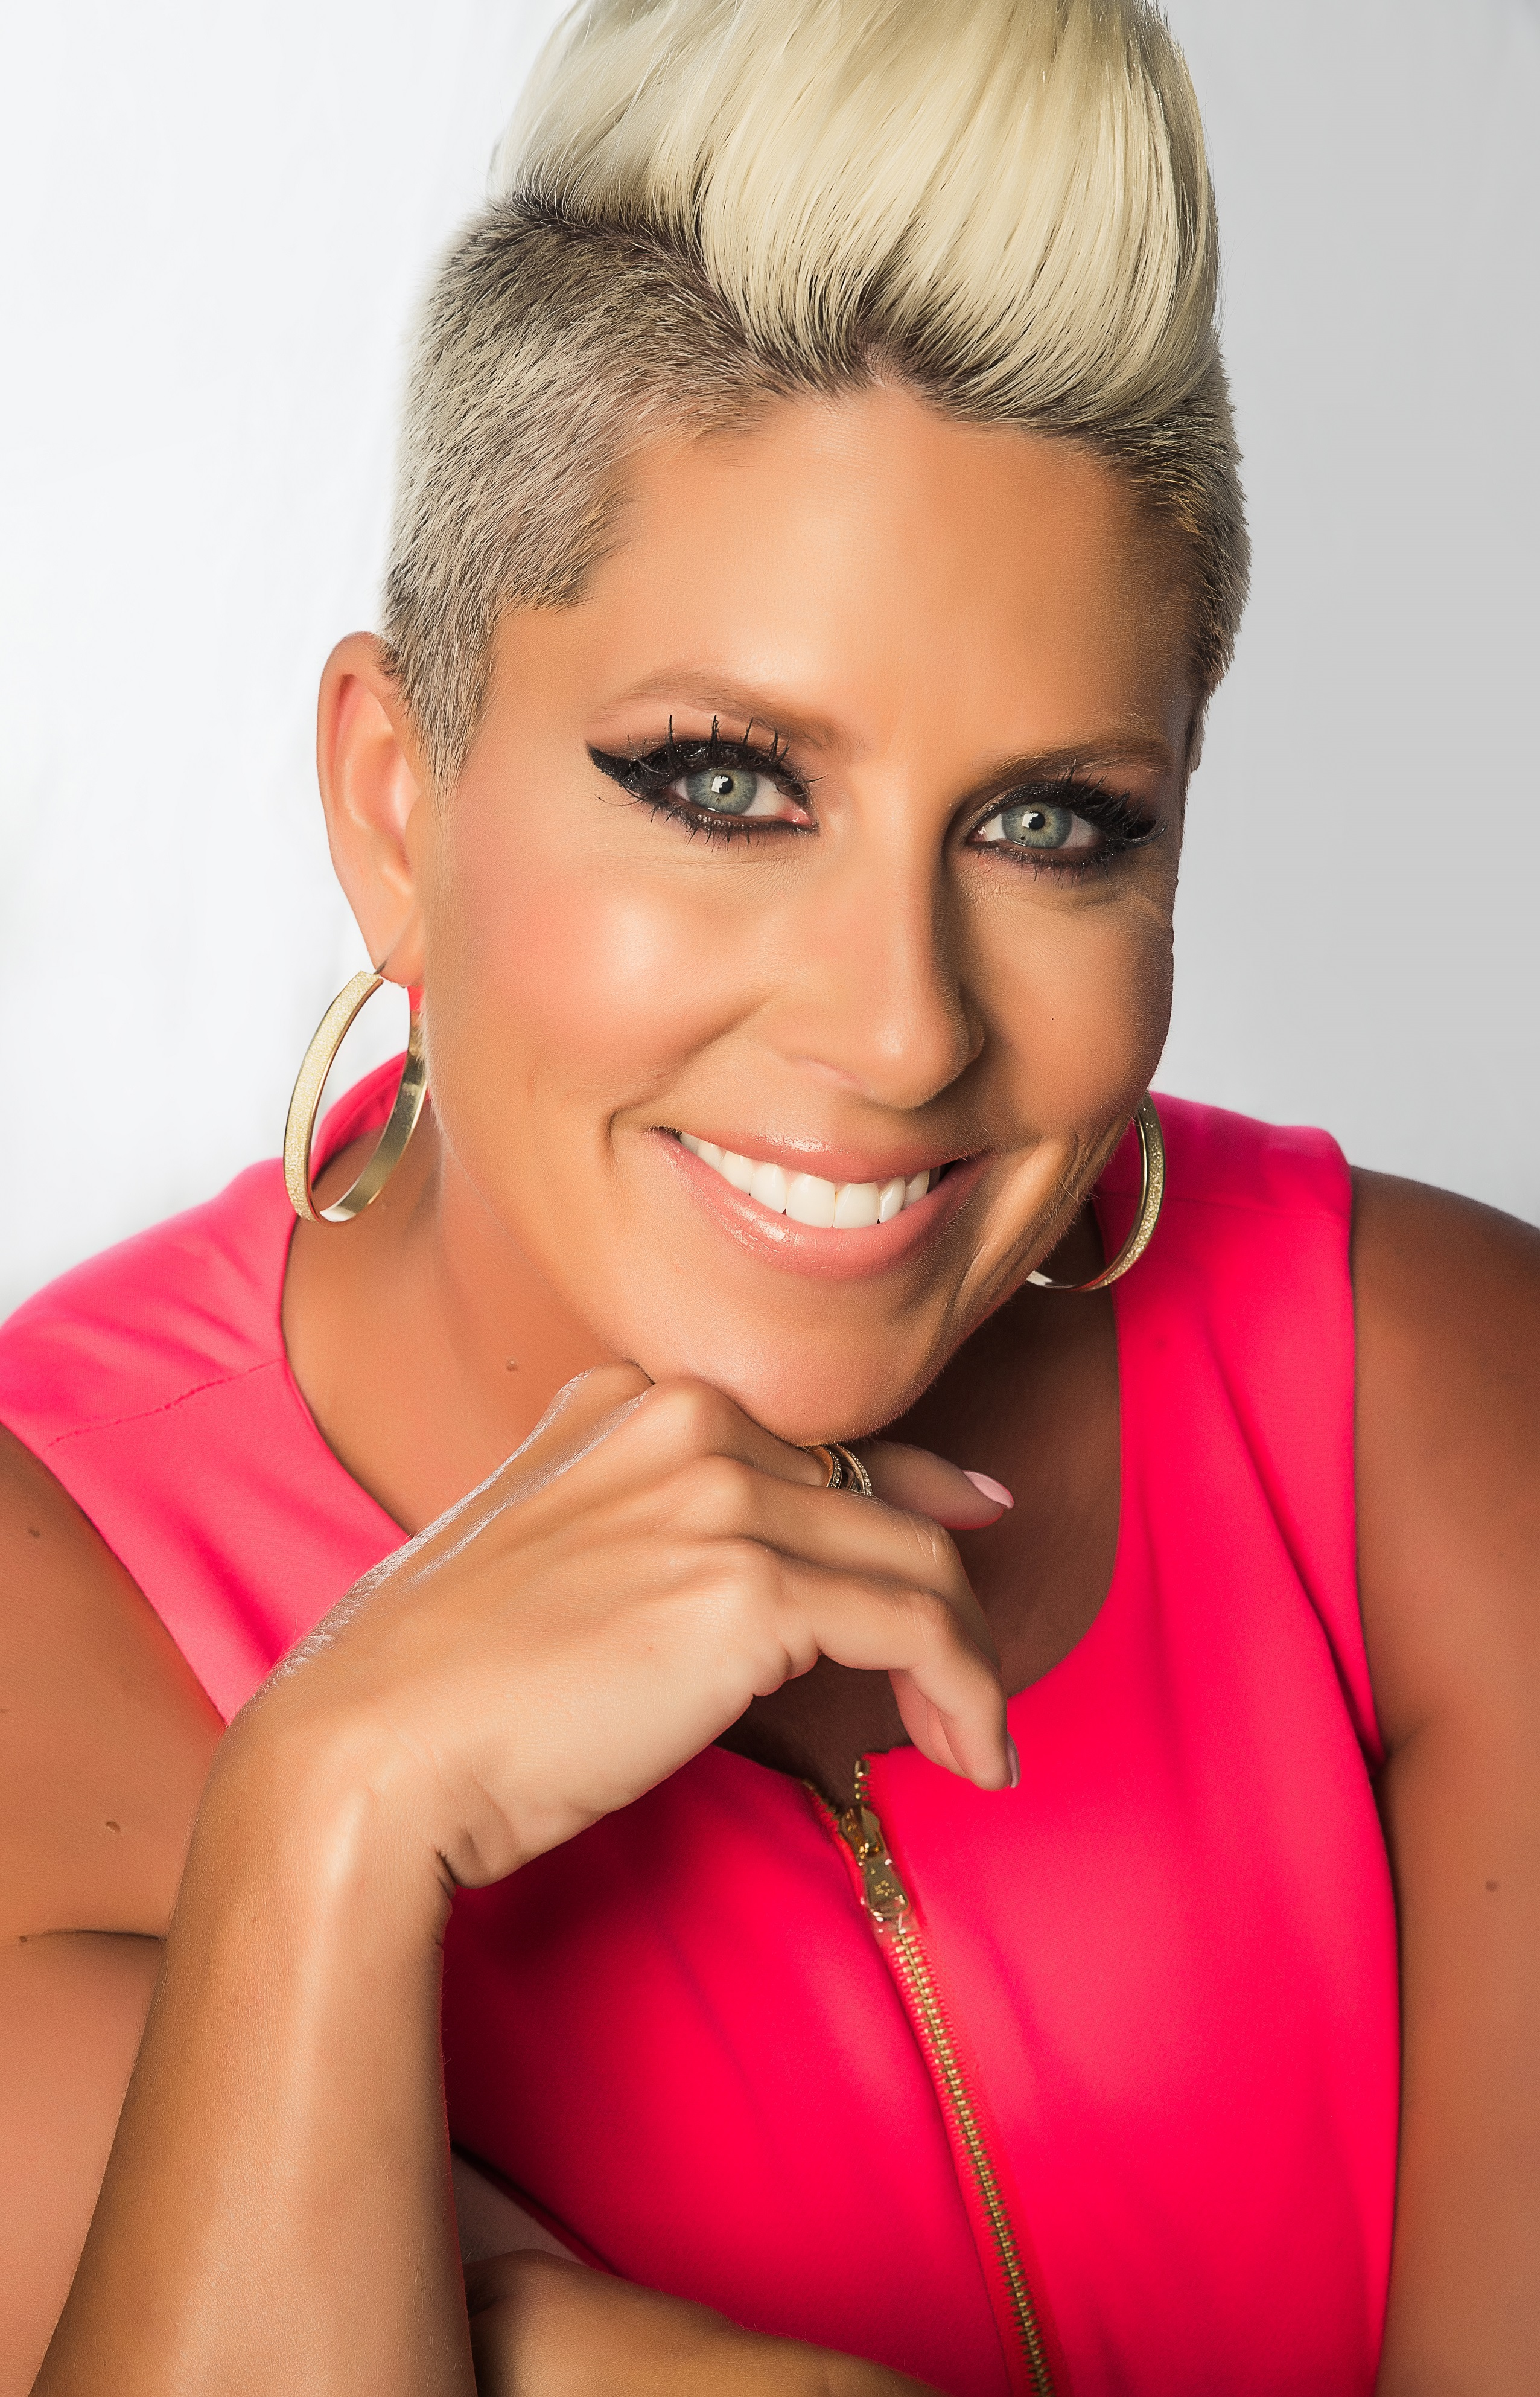 Five Star Automotive >> Beauty Expert Gina Rivera's Franchise Company Reaches Top 25